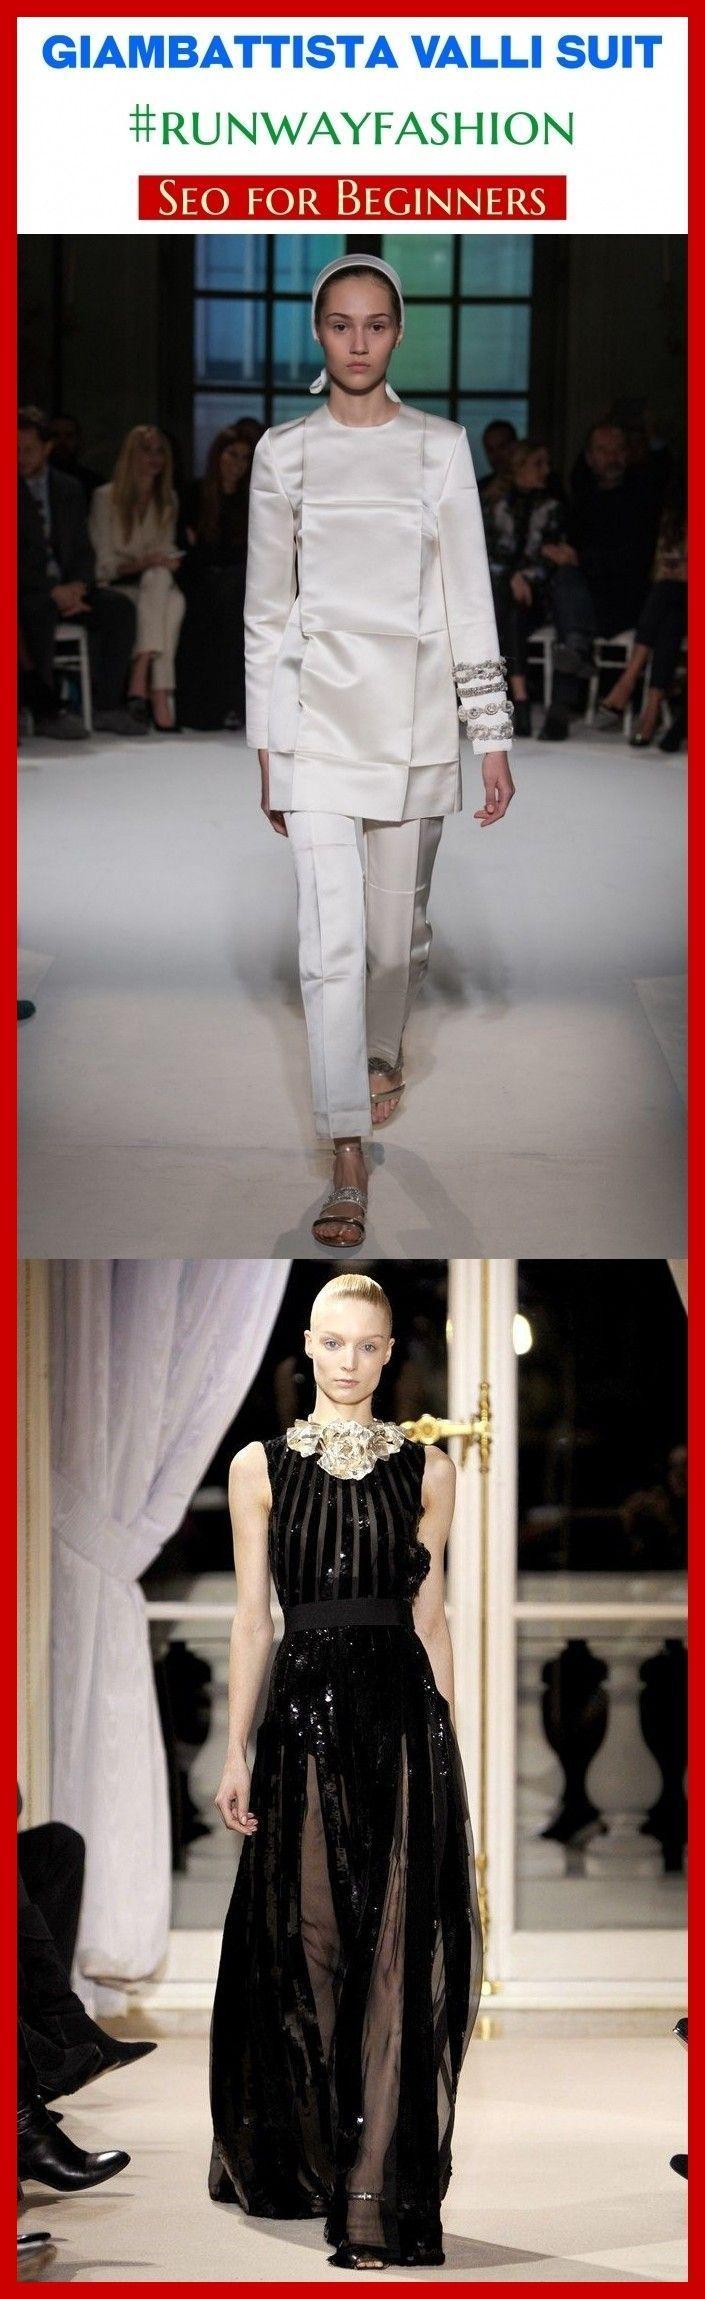 Photo of Celebrity style #Giambattista #valli Giambattista valli suit, Giambattista vall …